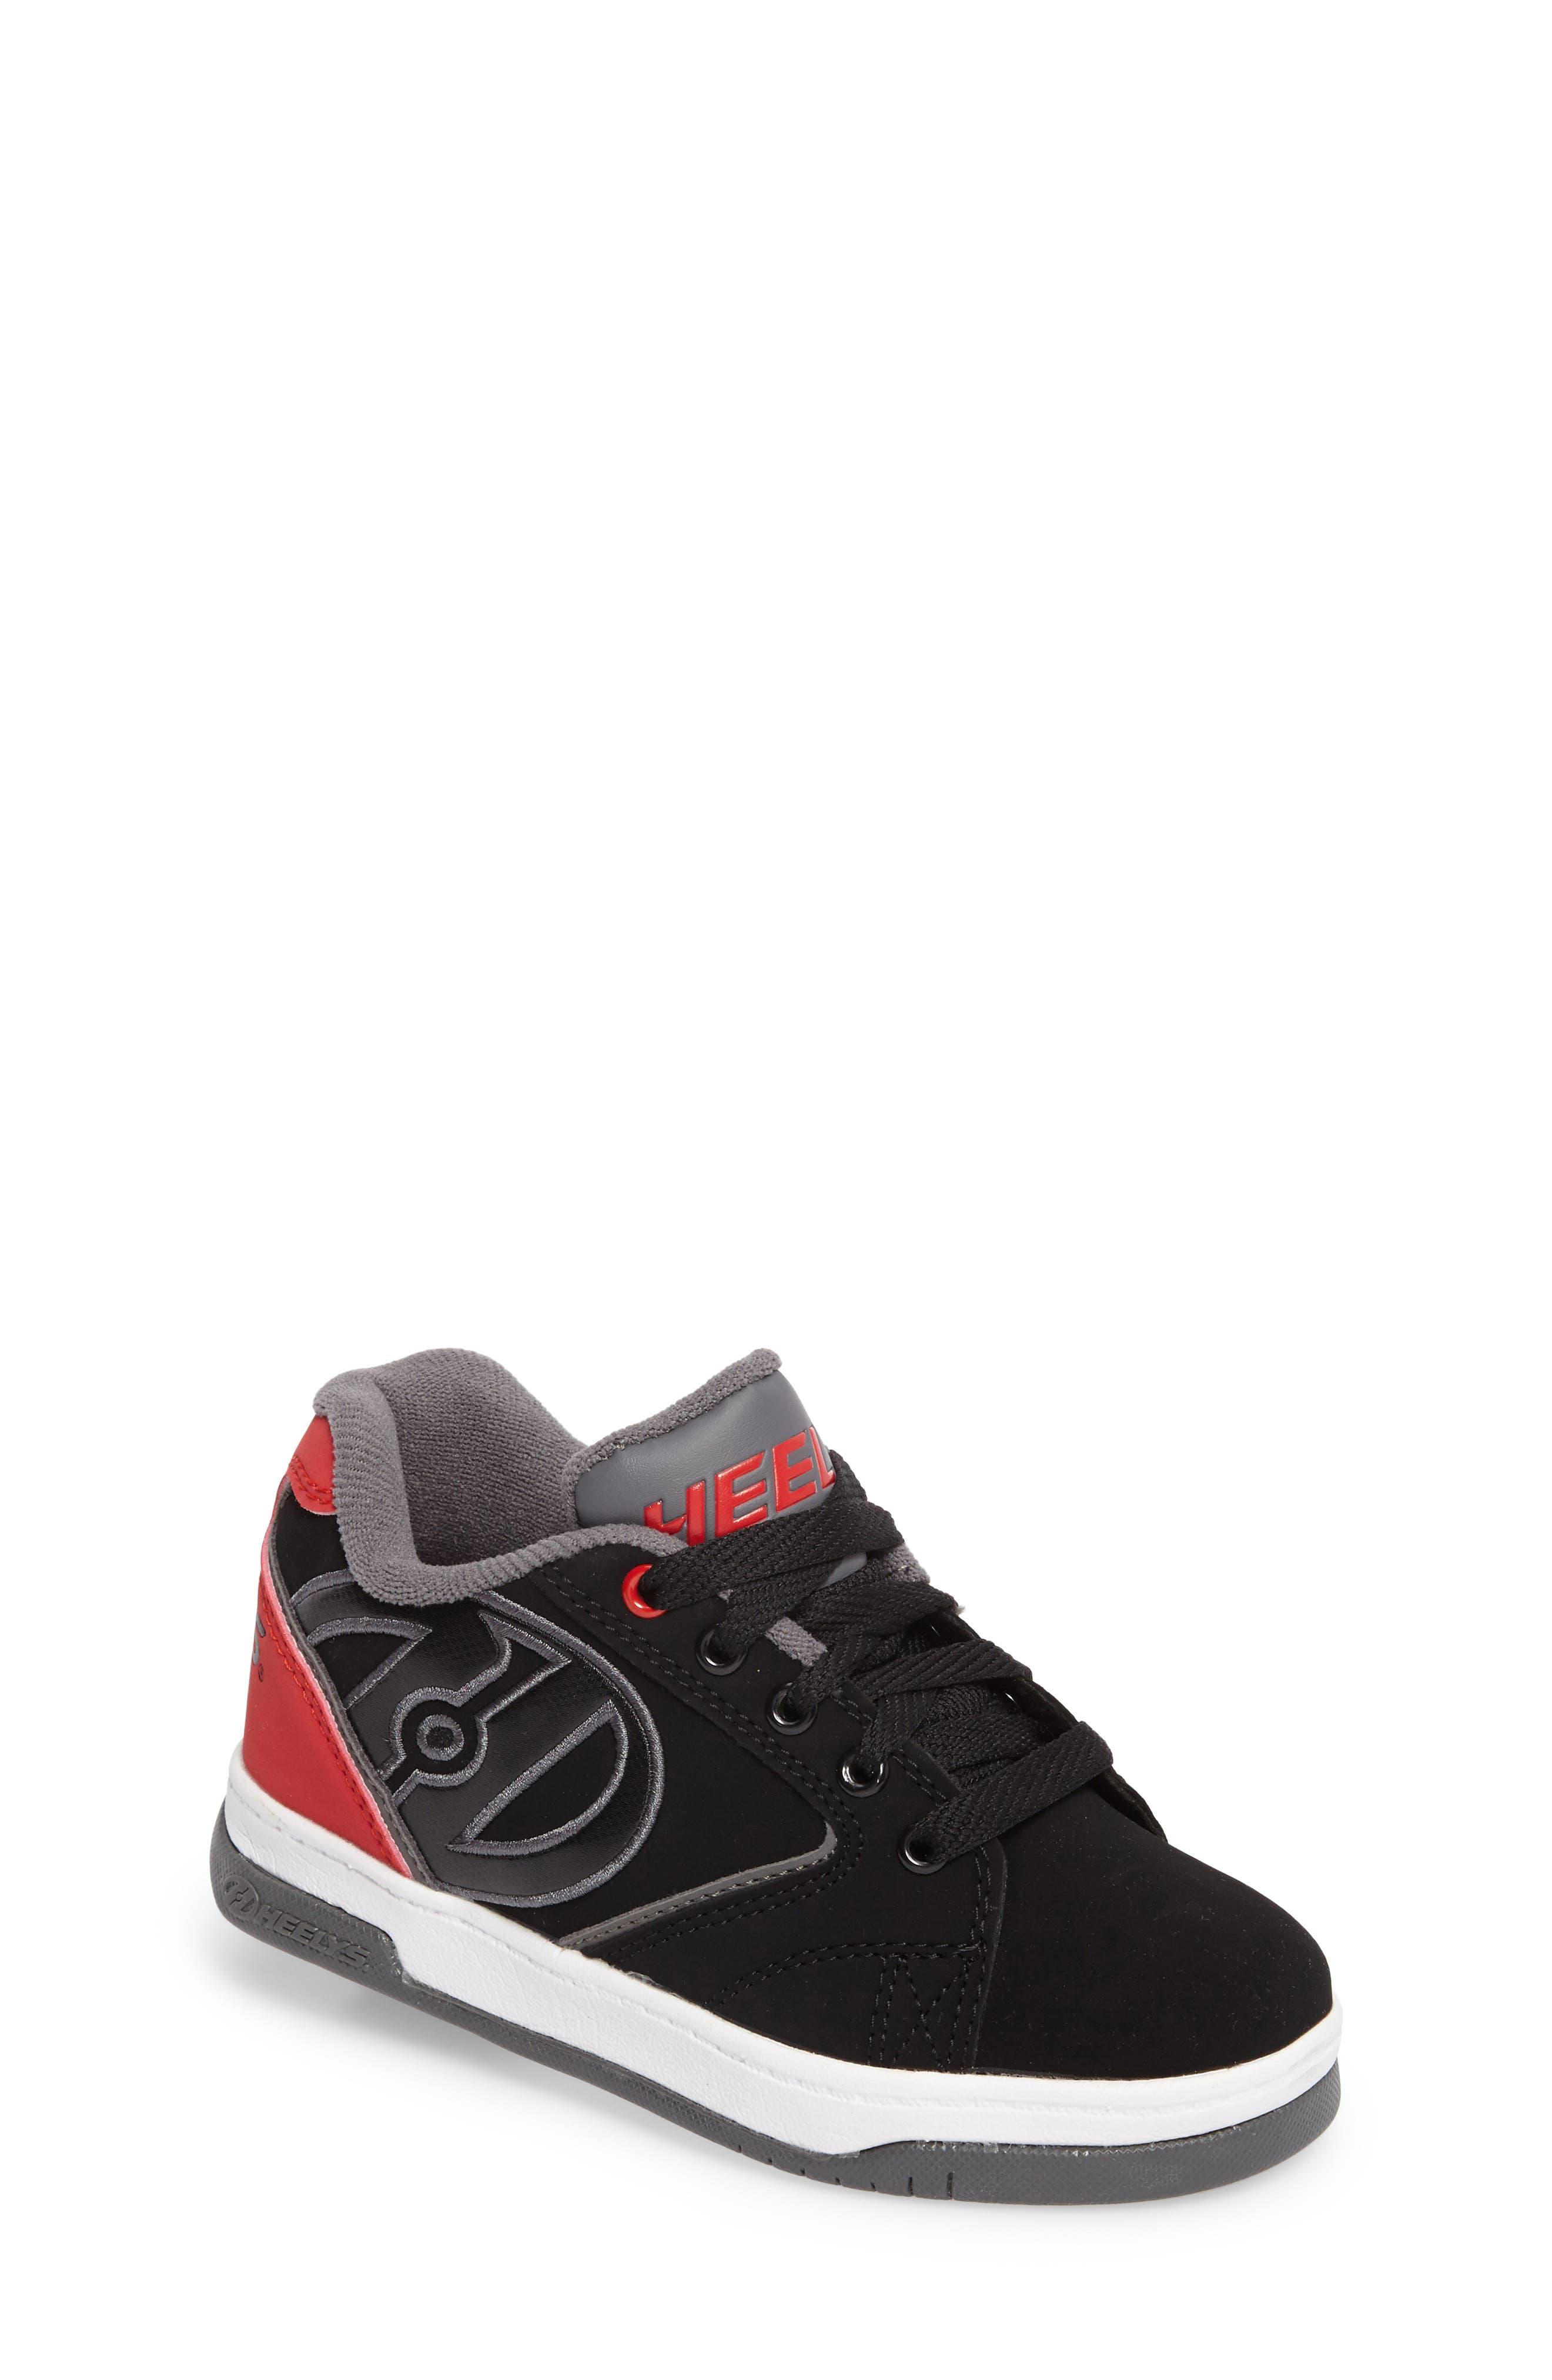 Heeleys'Propel 2.0' Sneaker,                         Main,                         color, Black/ Red/ Grey